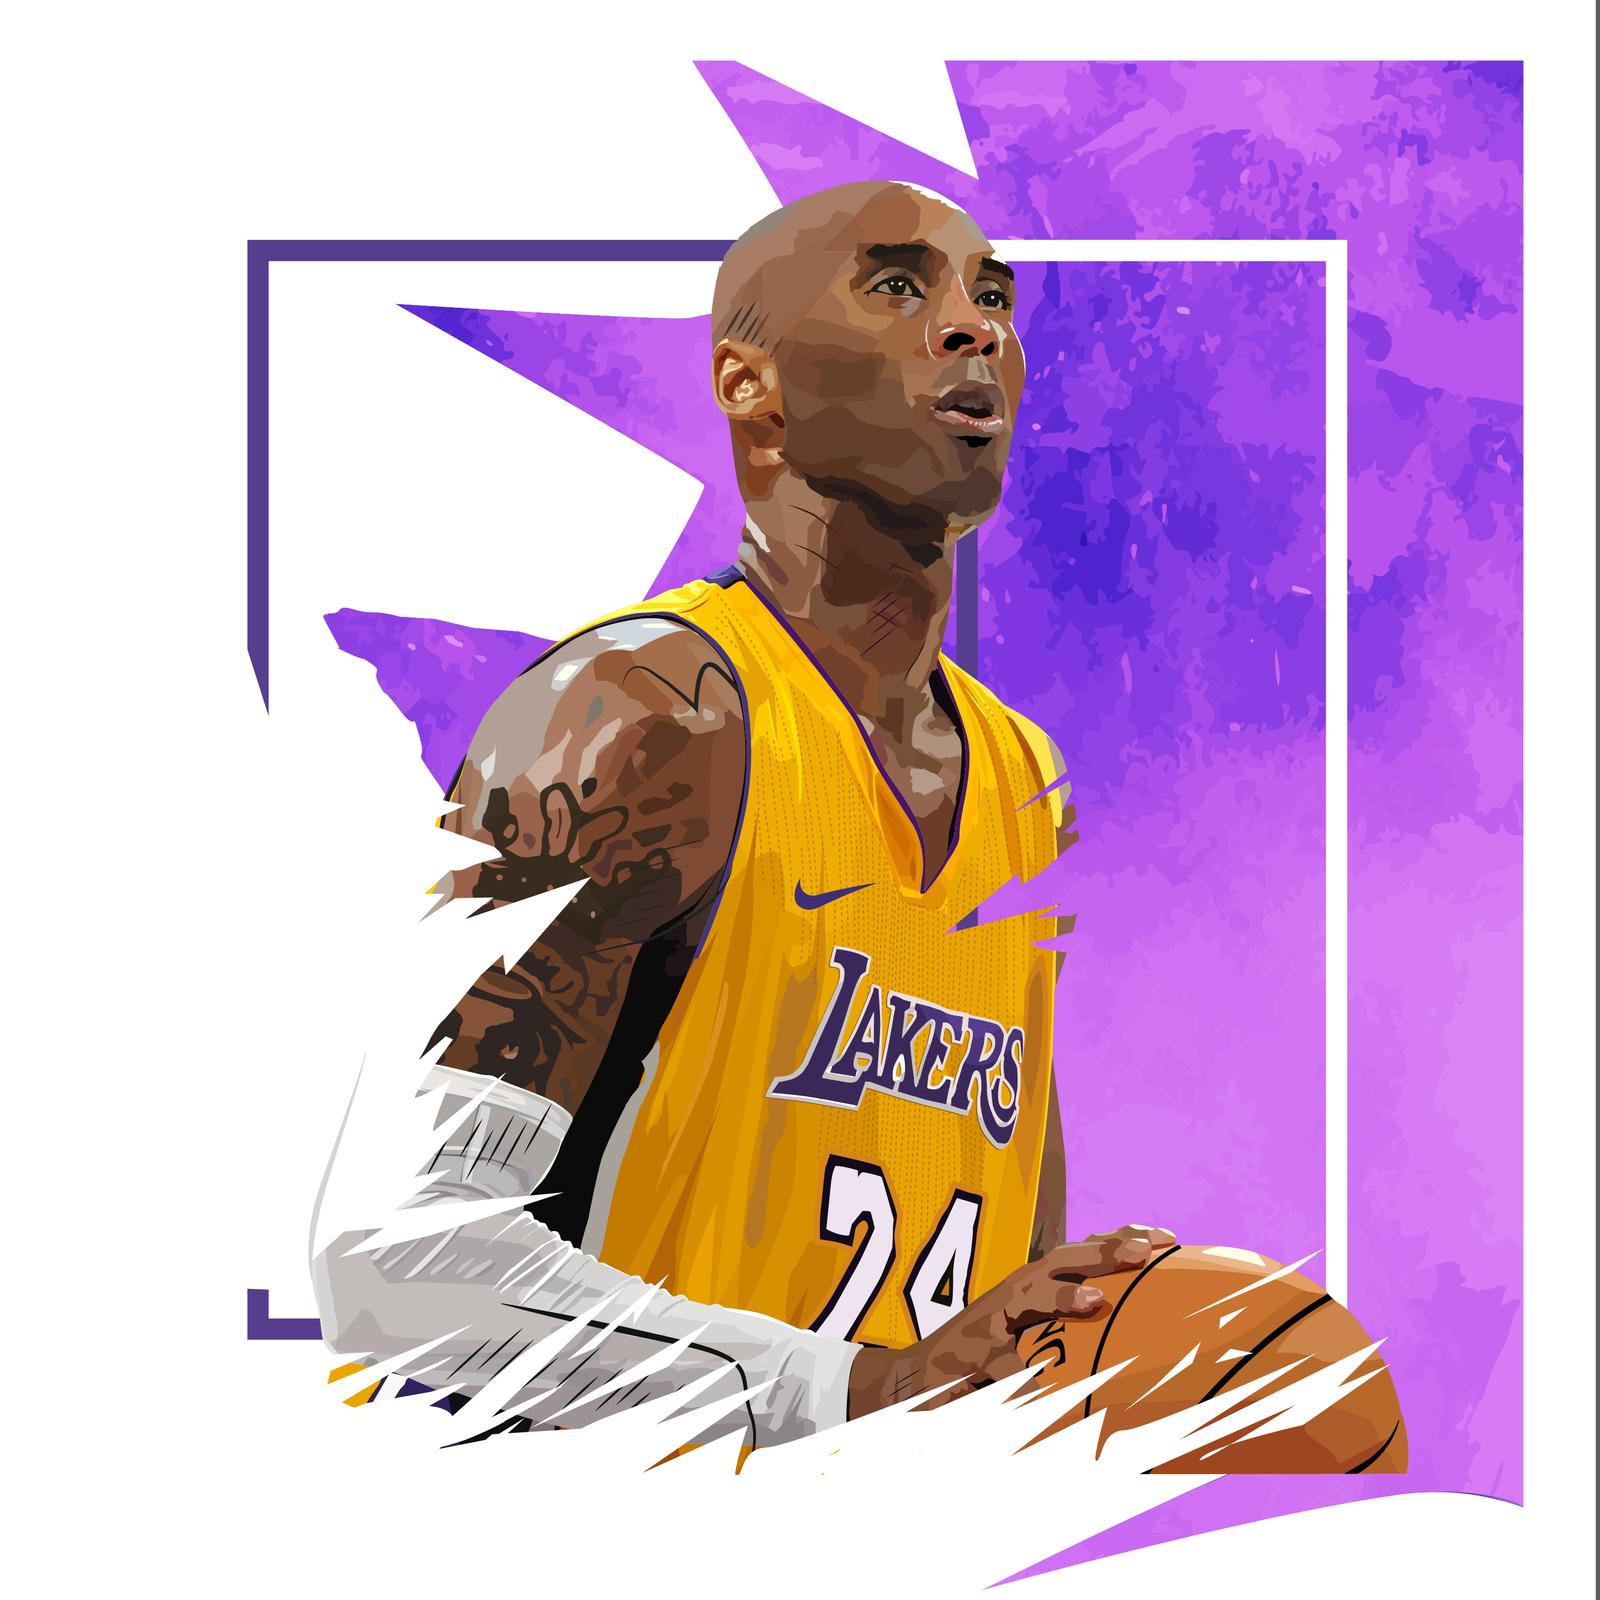 Works Sio in 2020 Nba wallpapers, Mvp basketball, Kobe